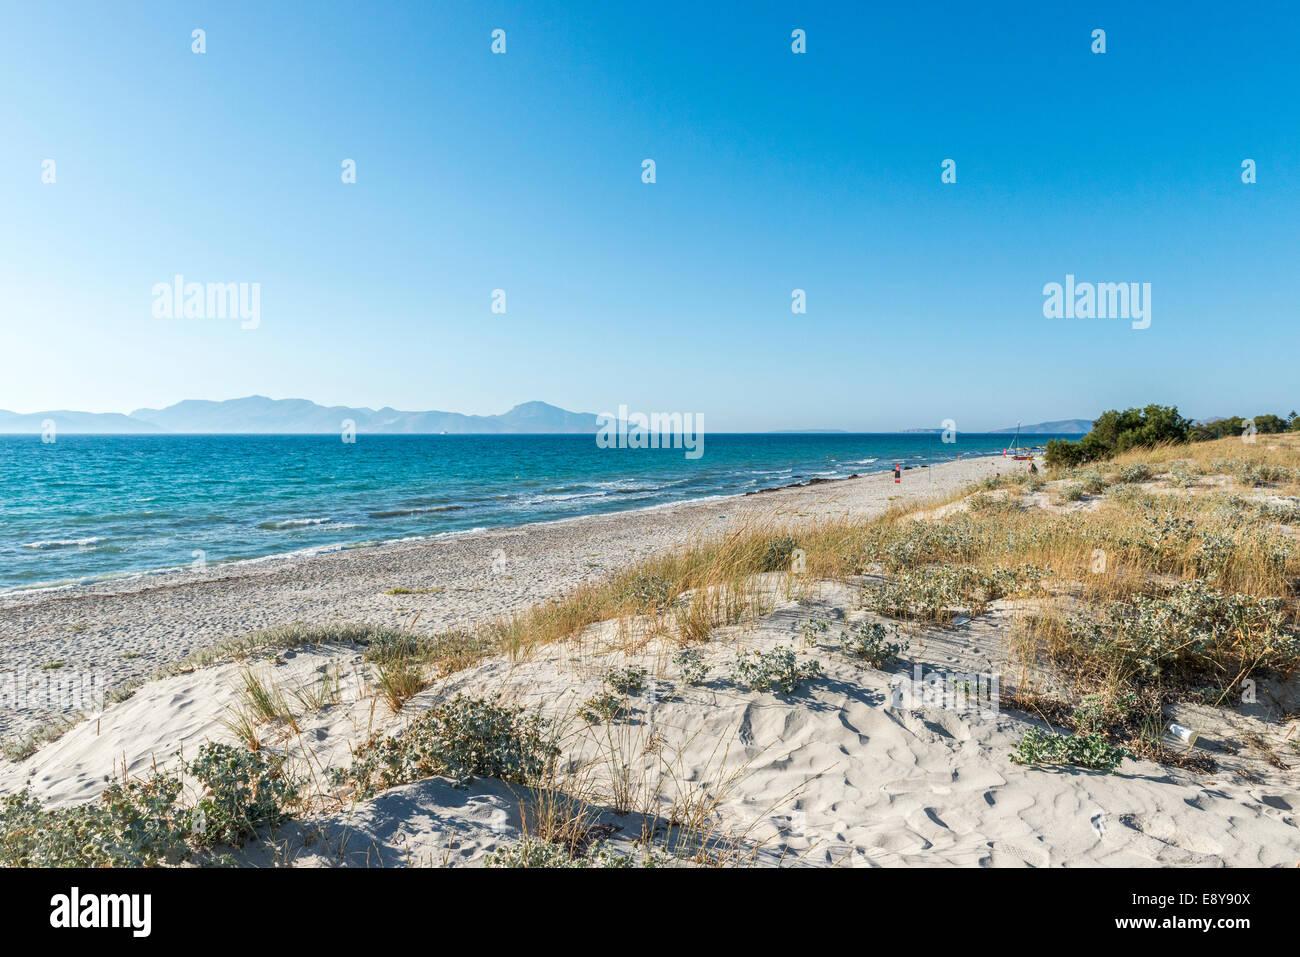 Empty beach, sand dunes and Mediterranean Sea, panoramic view, Mastichari, Kos, Greece - Stock Image